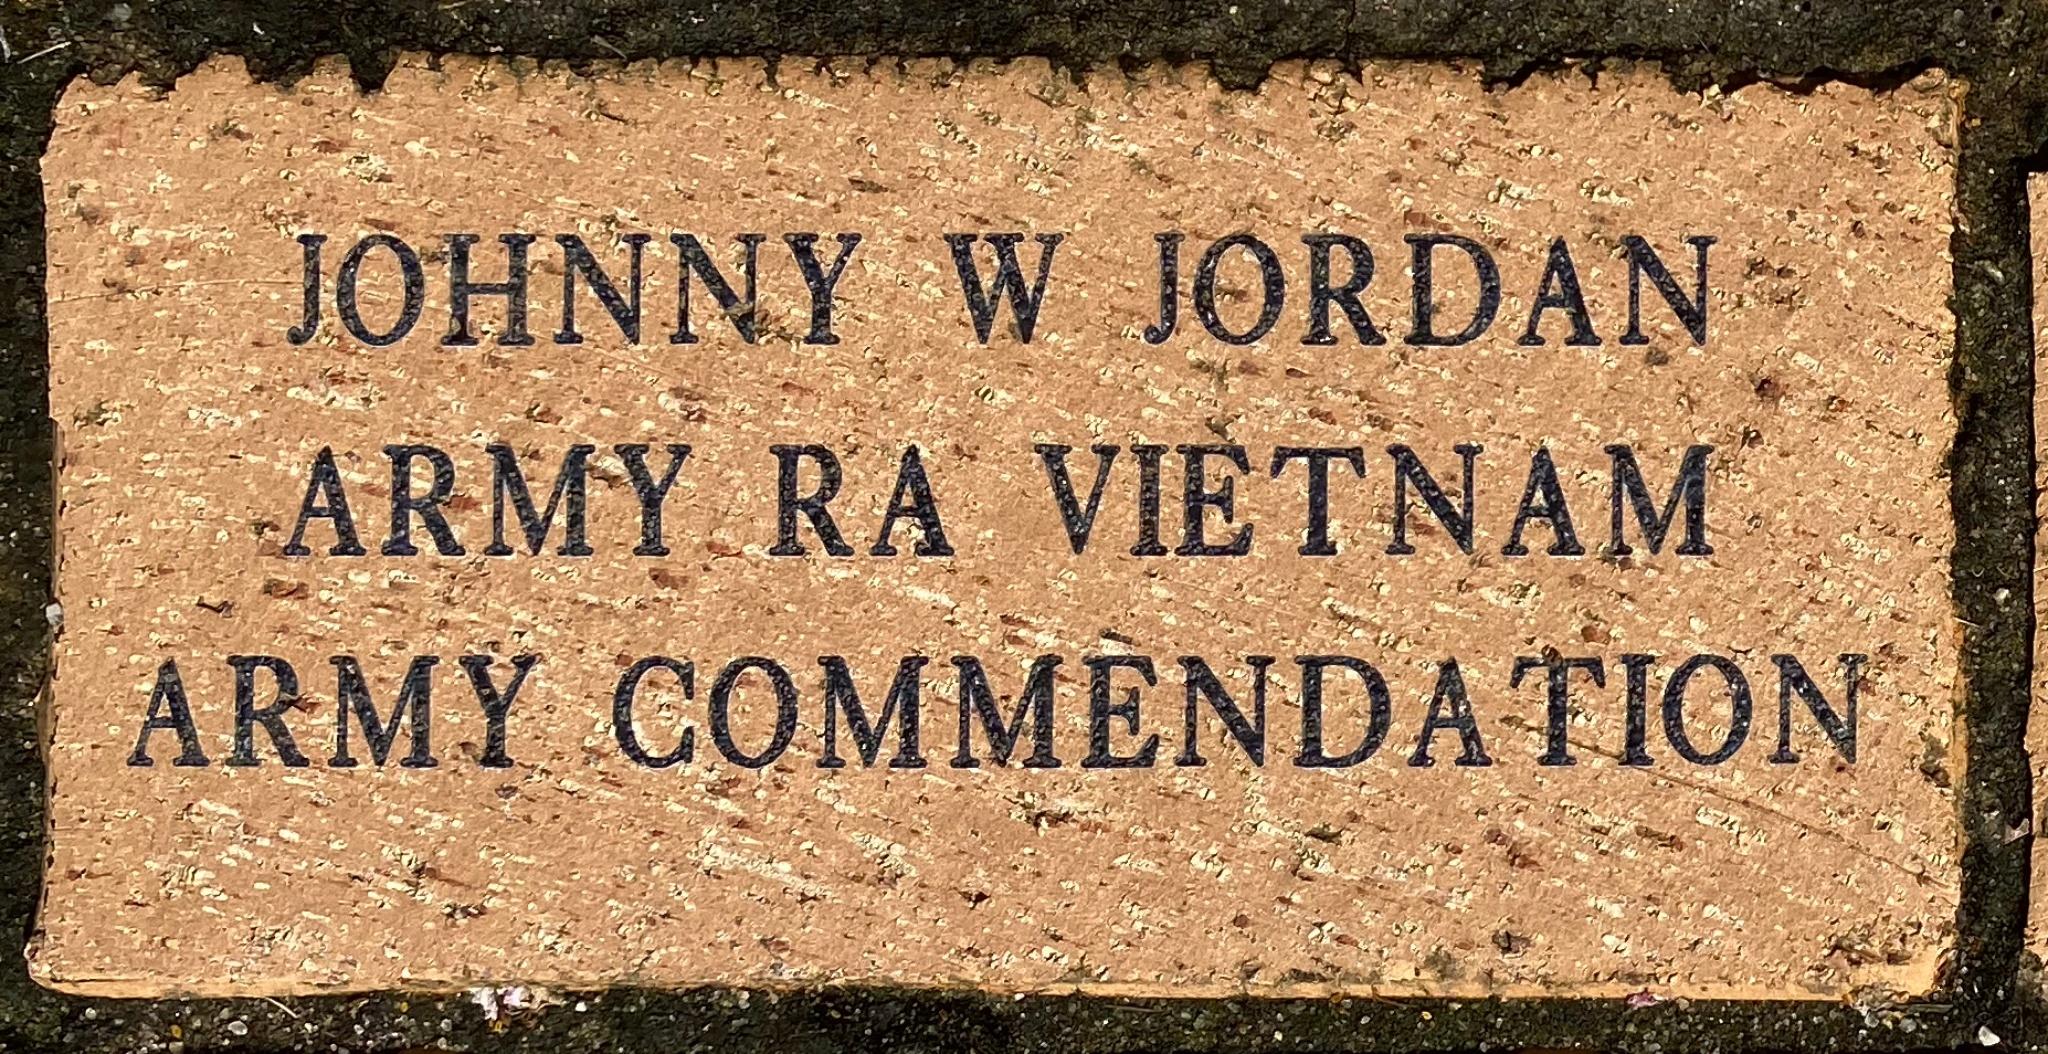 JOHNNY W JORDAN ARMY RA VIETNAM ARMY COMMENDATION